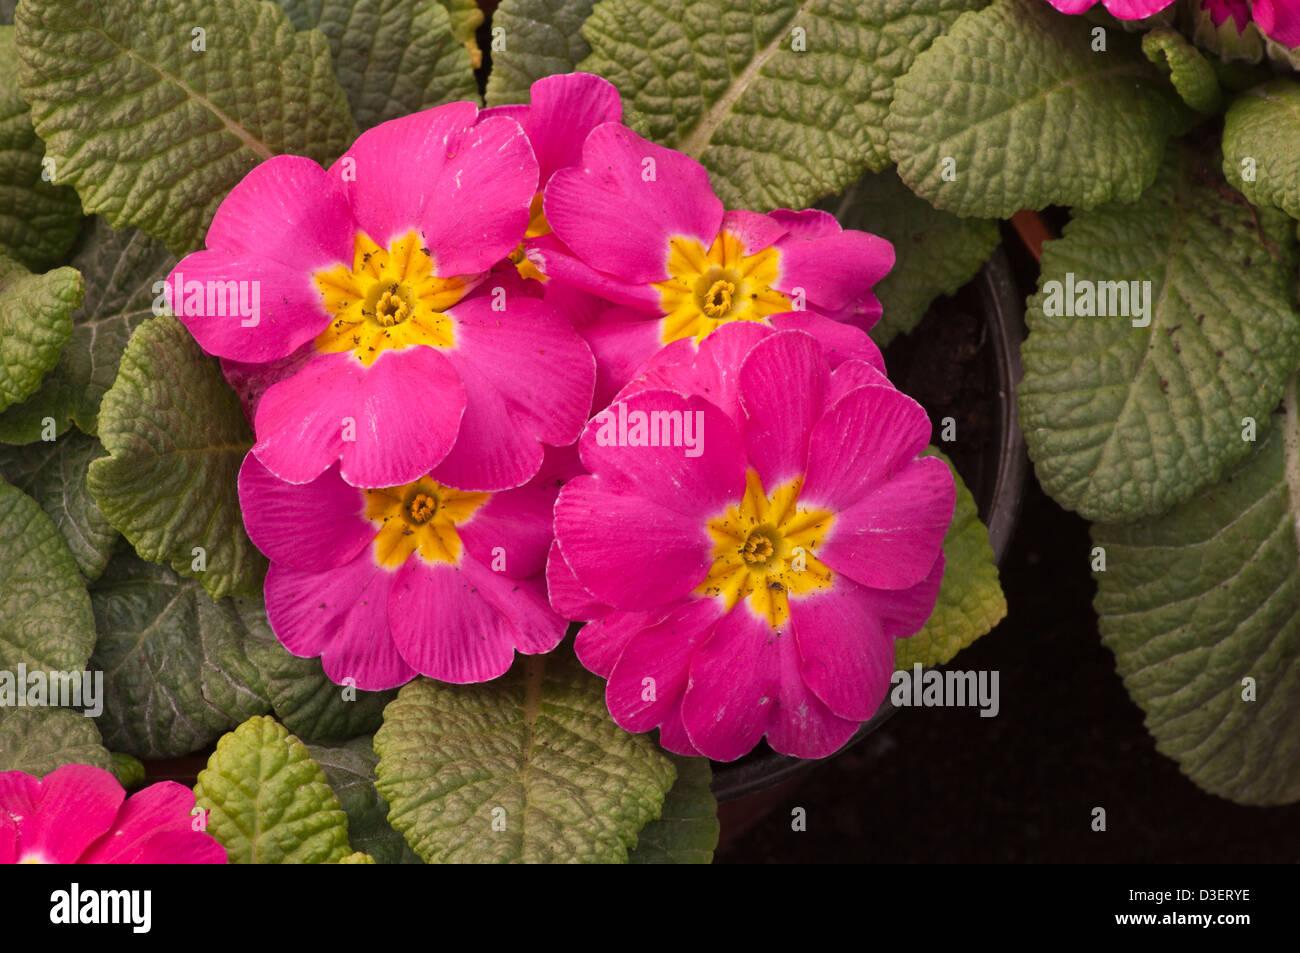 Primroses Pink Flowers Stock Photos Primroses Pink Flowers Stock